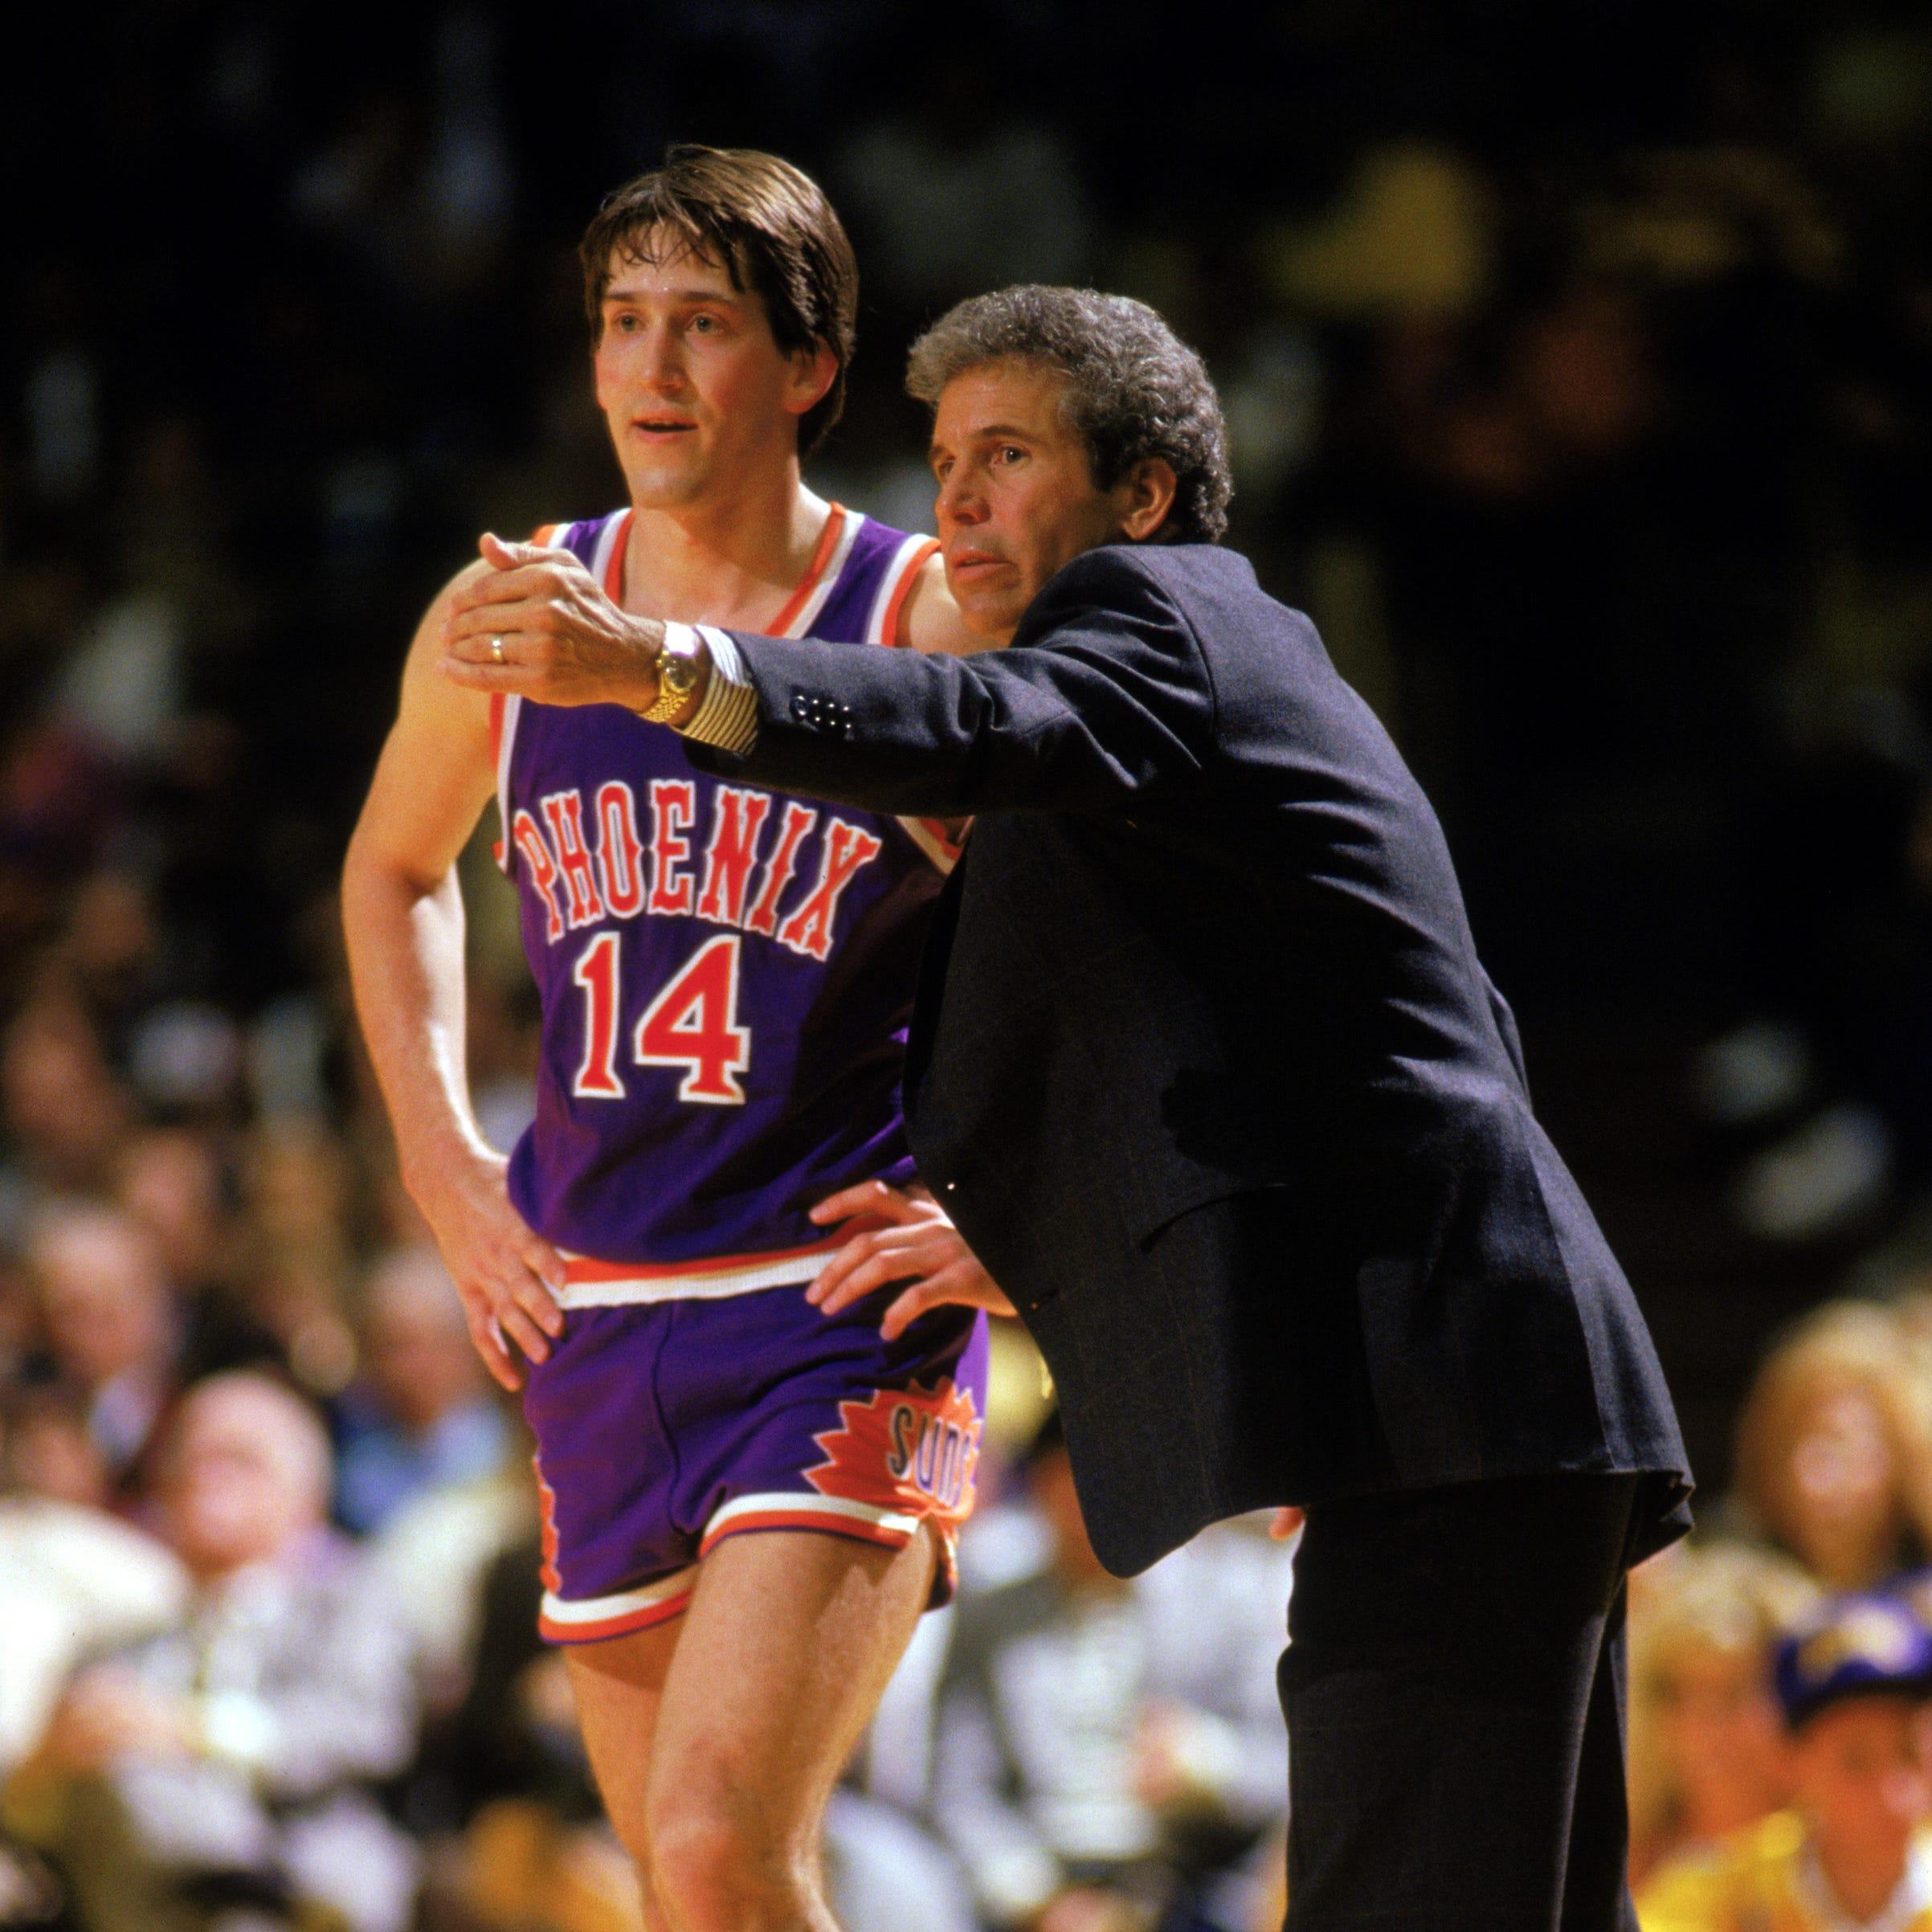 Former Phoenix Suns coach John MacLeod dies at 81